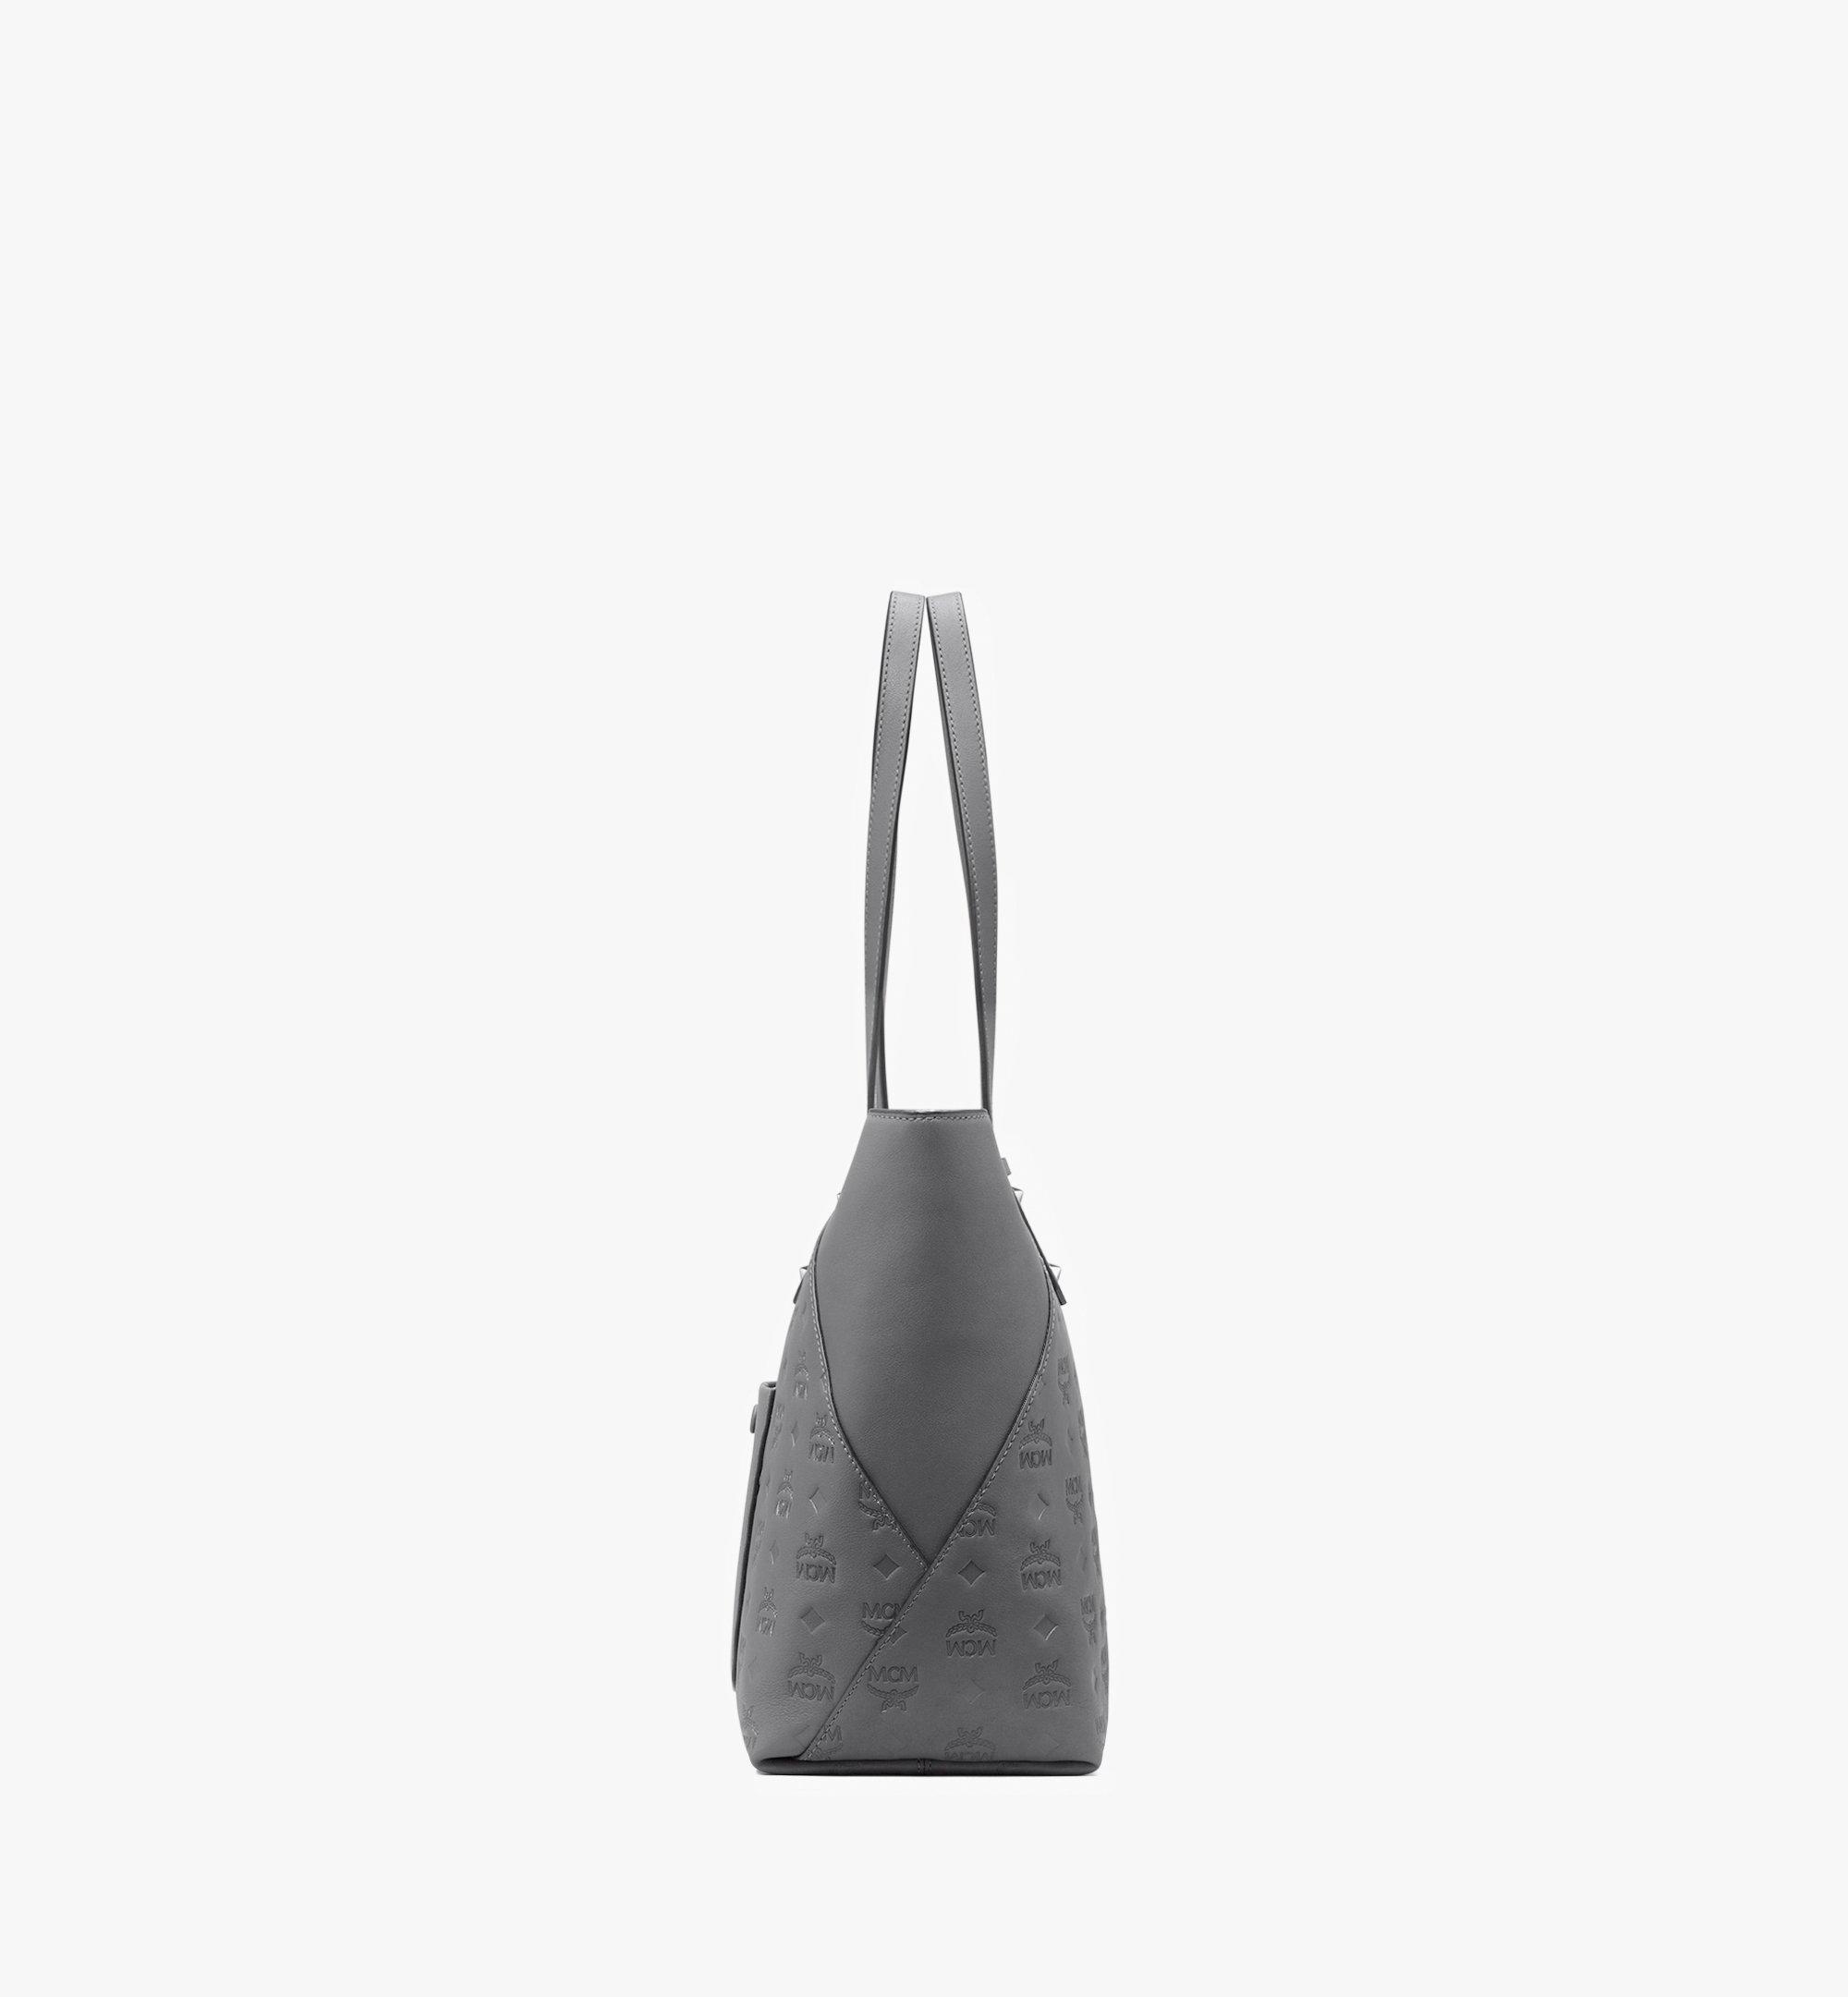 Medium Klara Shopper aus Leder mit Monogramm Charcoal | MCM® DE